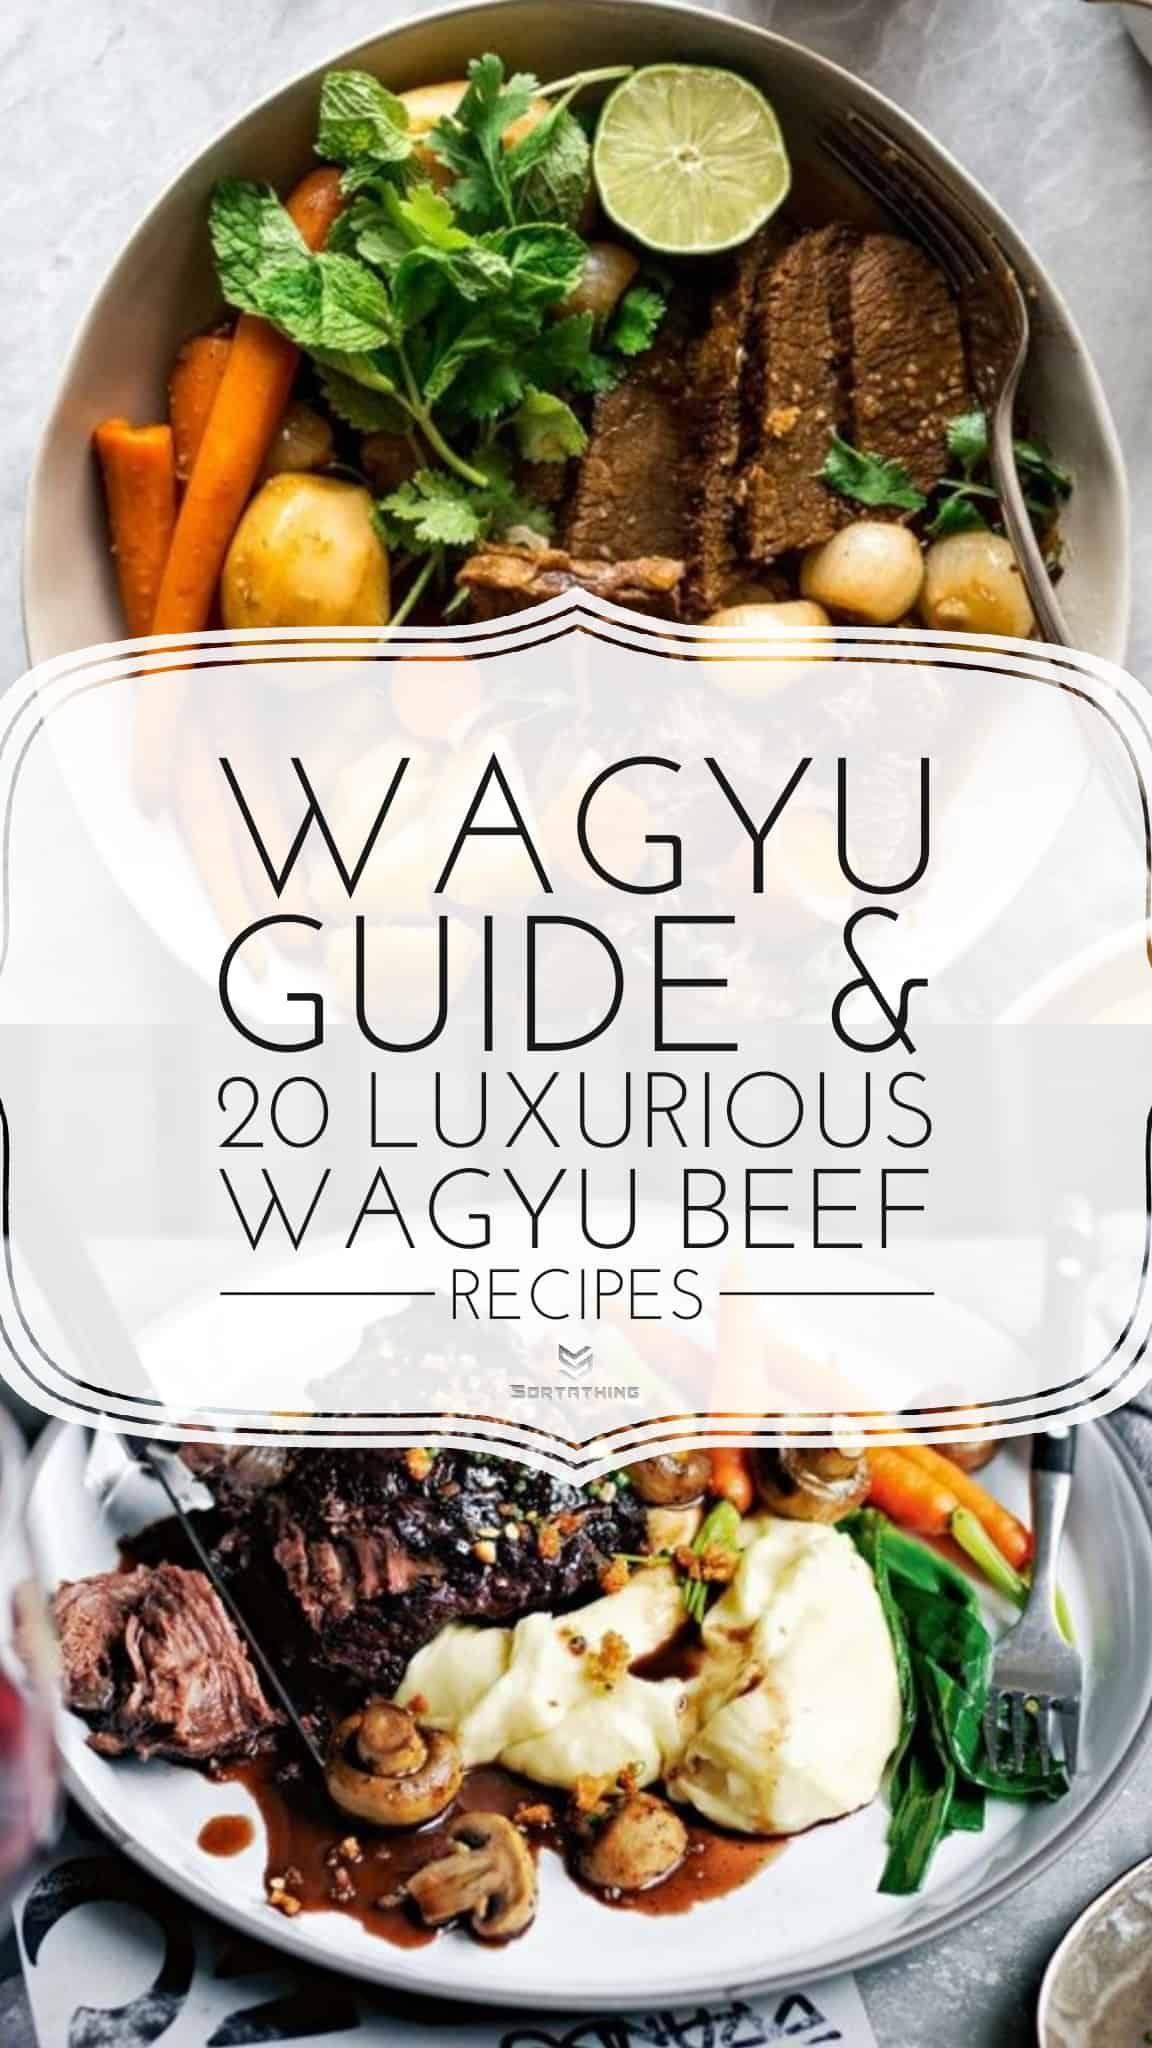 Vietnamese Braised Wagyu Brisket Recipe and Daube with Wagyu Beef